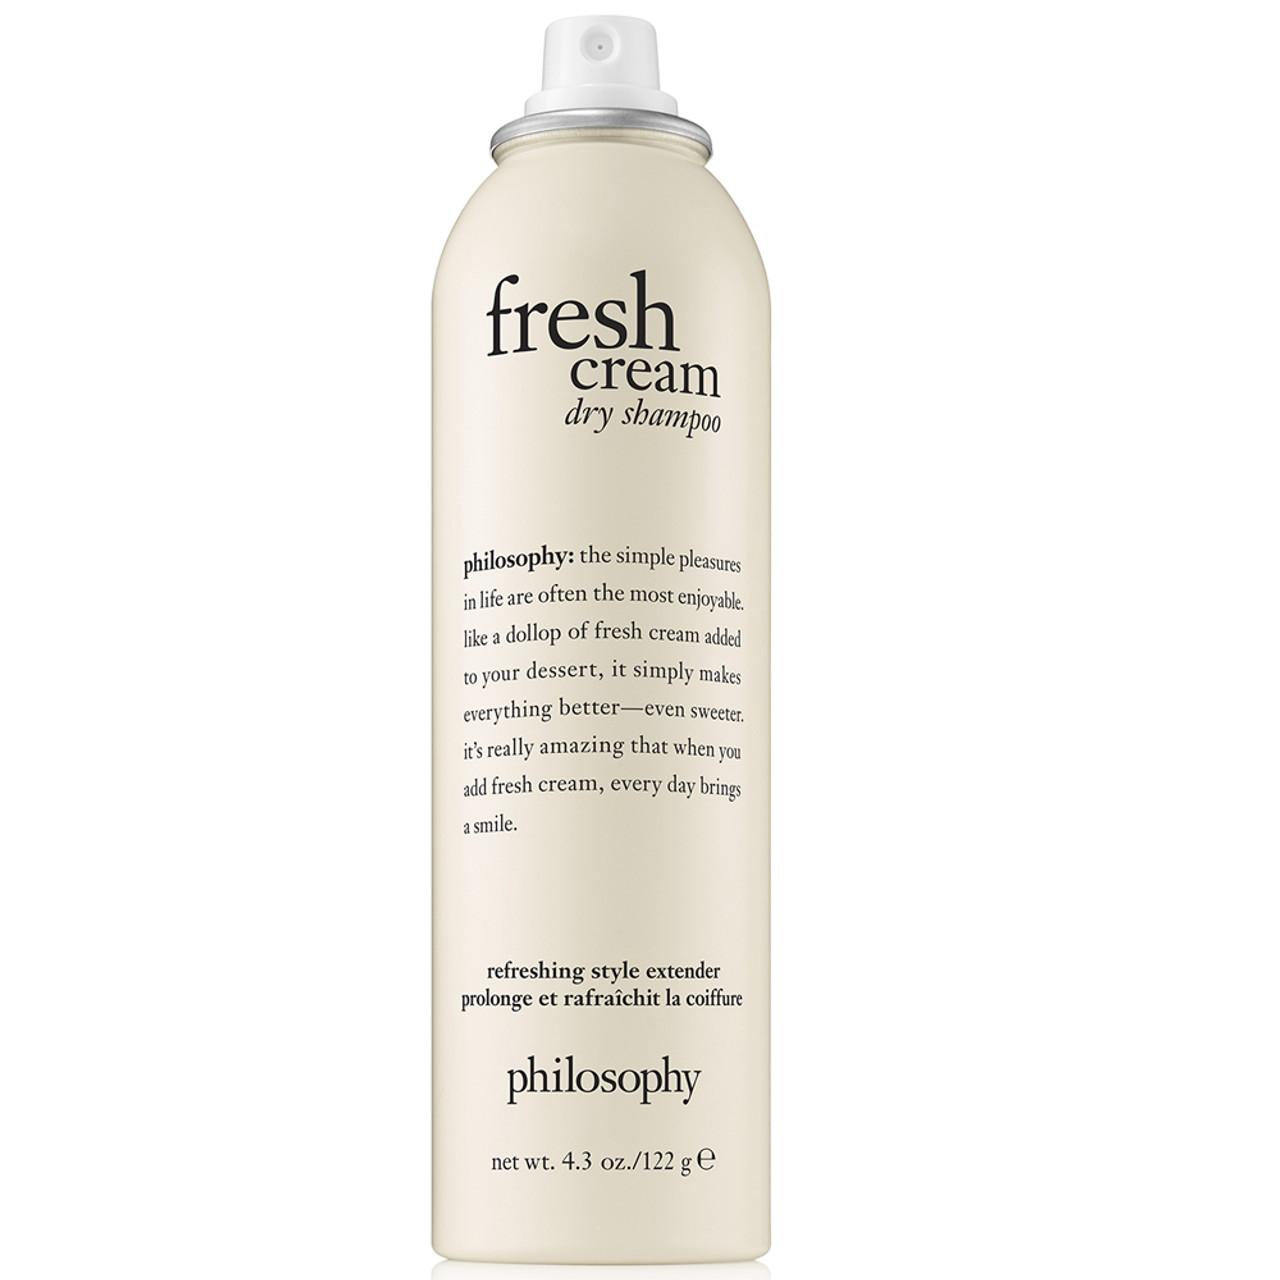 philosophy Fresh Cream Dry Shampoo